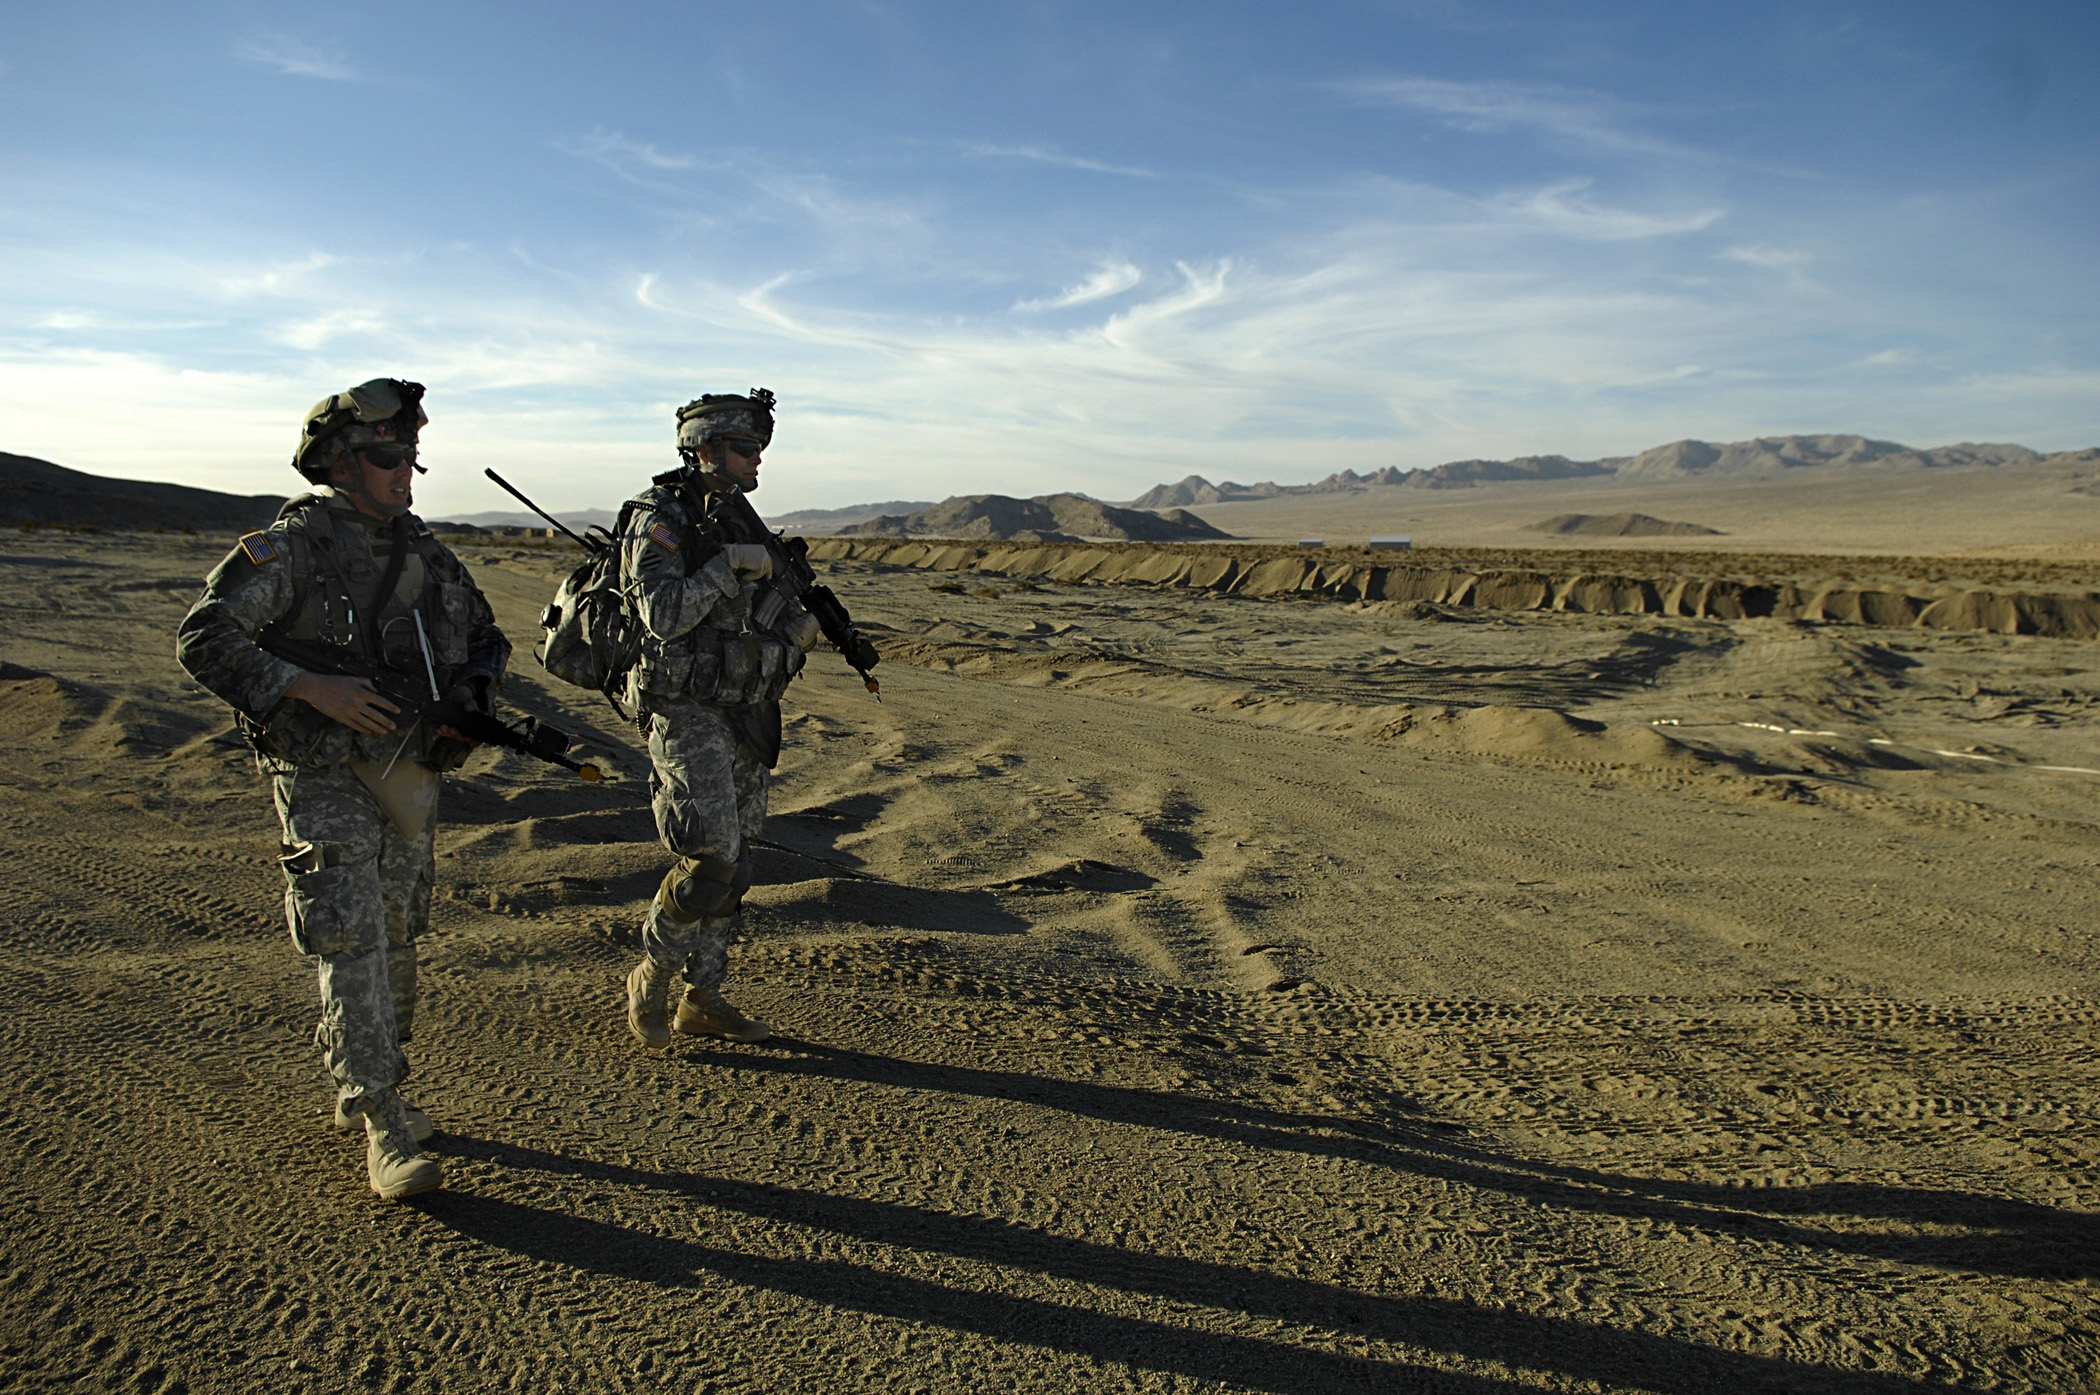 Obama Sending U.S. Troops to Egypt